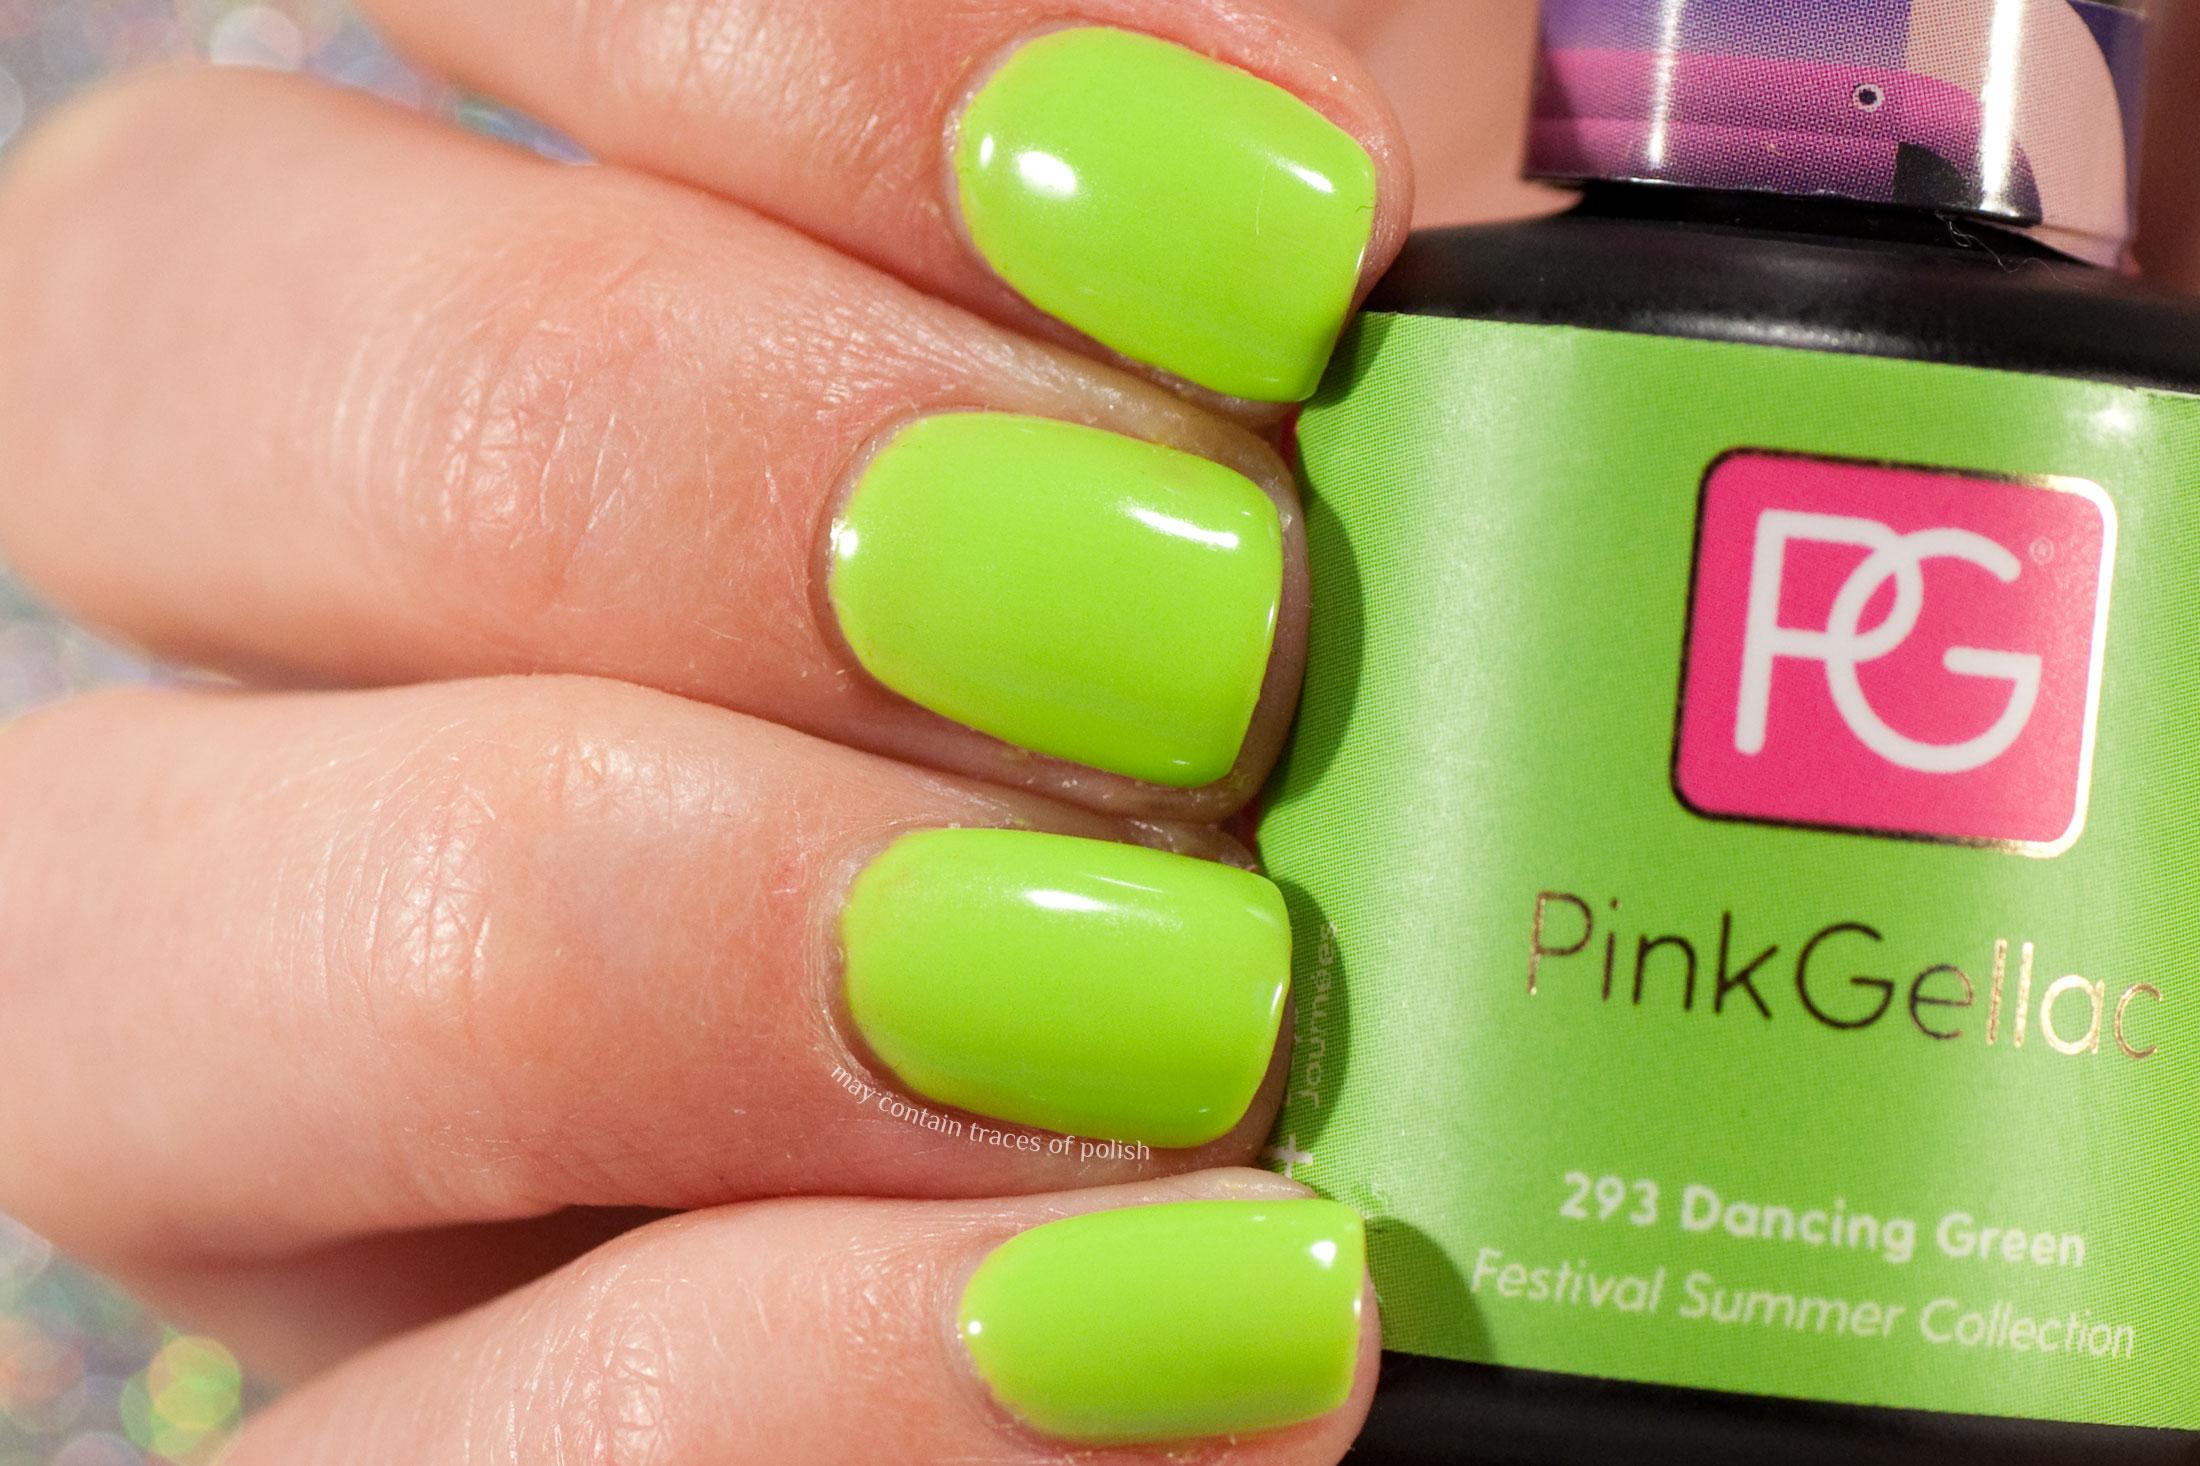 Pink Gellac 293 Dancing Green